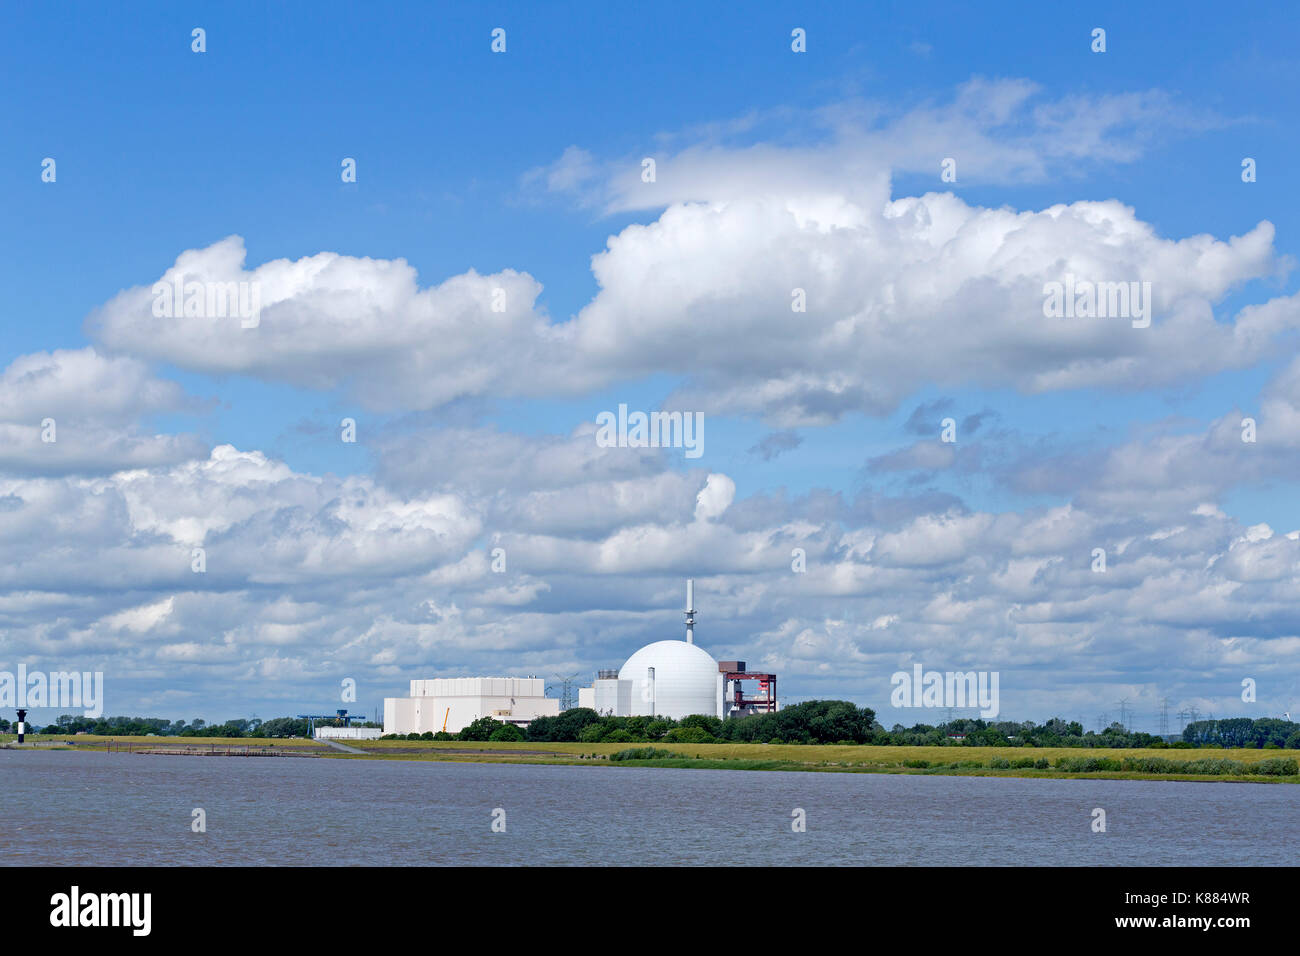 atomic power station Brokdorf, River Elbe, Schleswig-Holstein, Germany - Stock Image